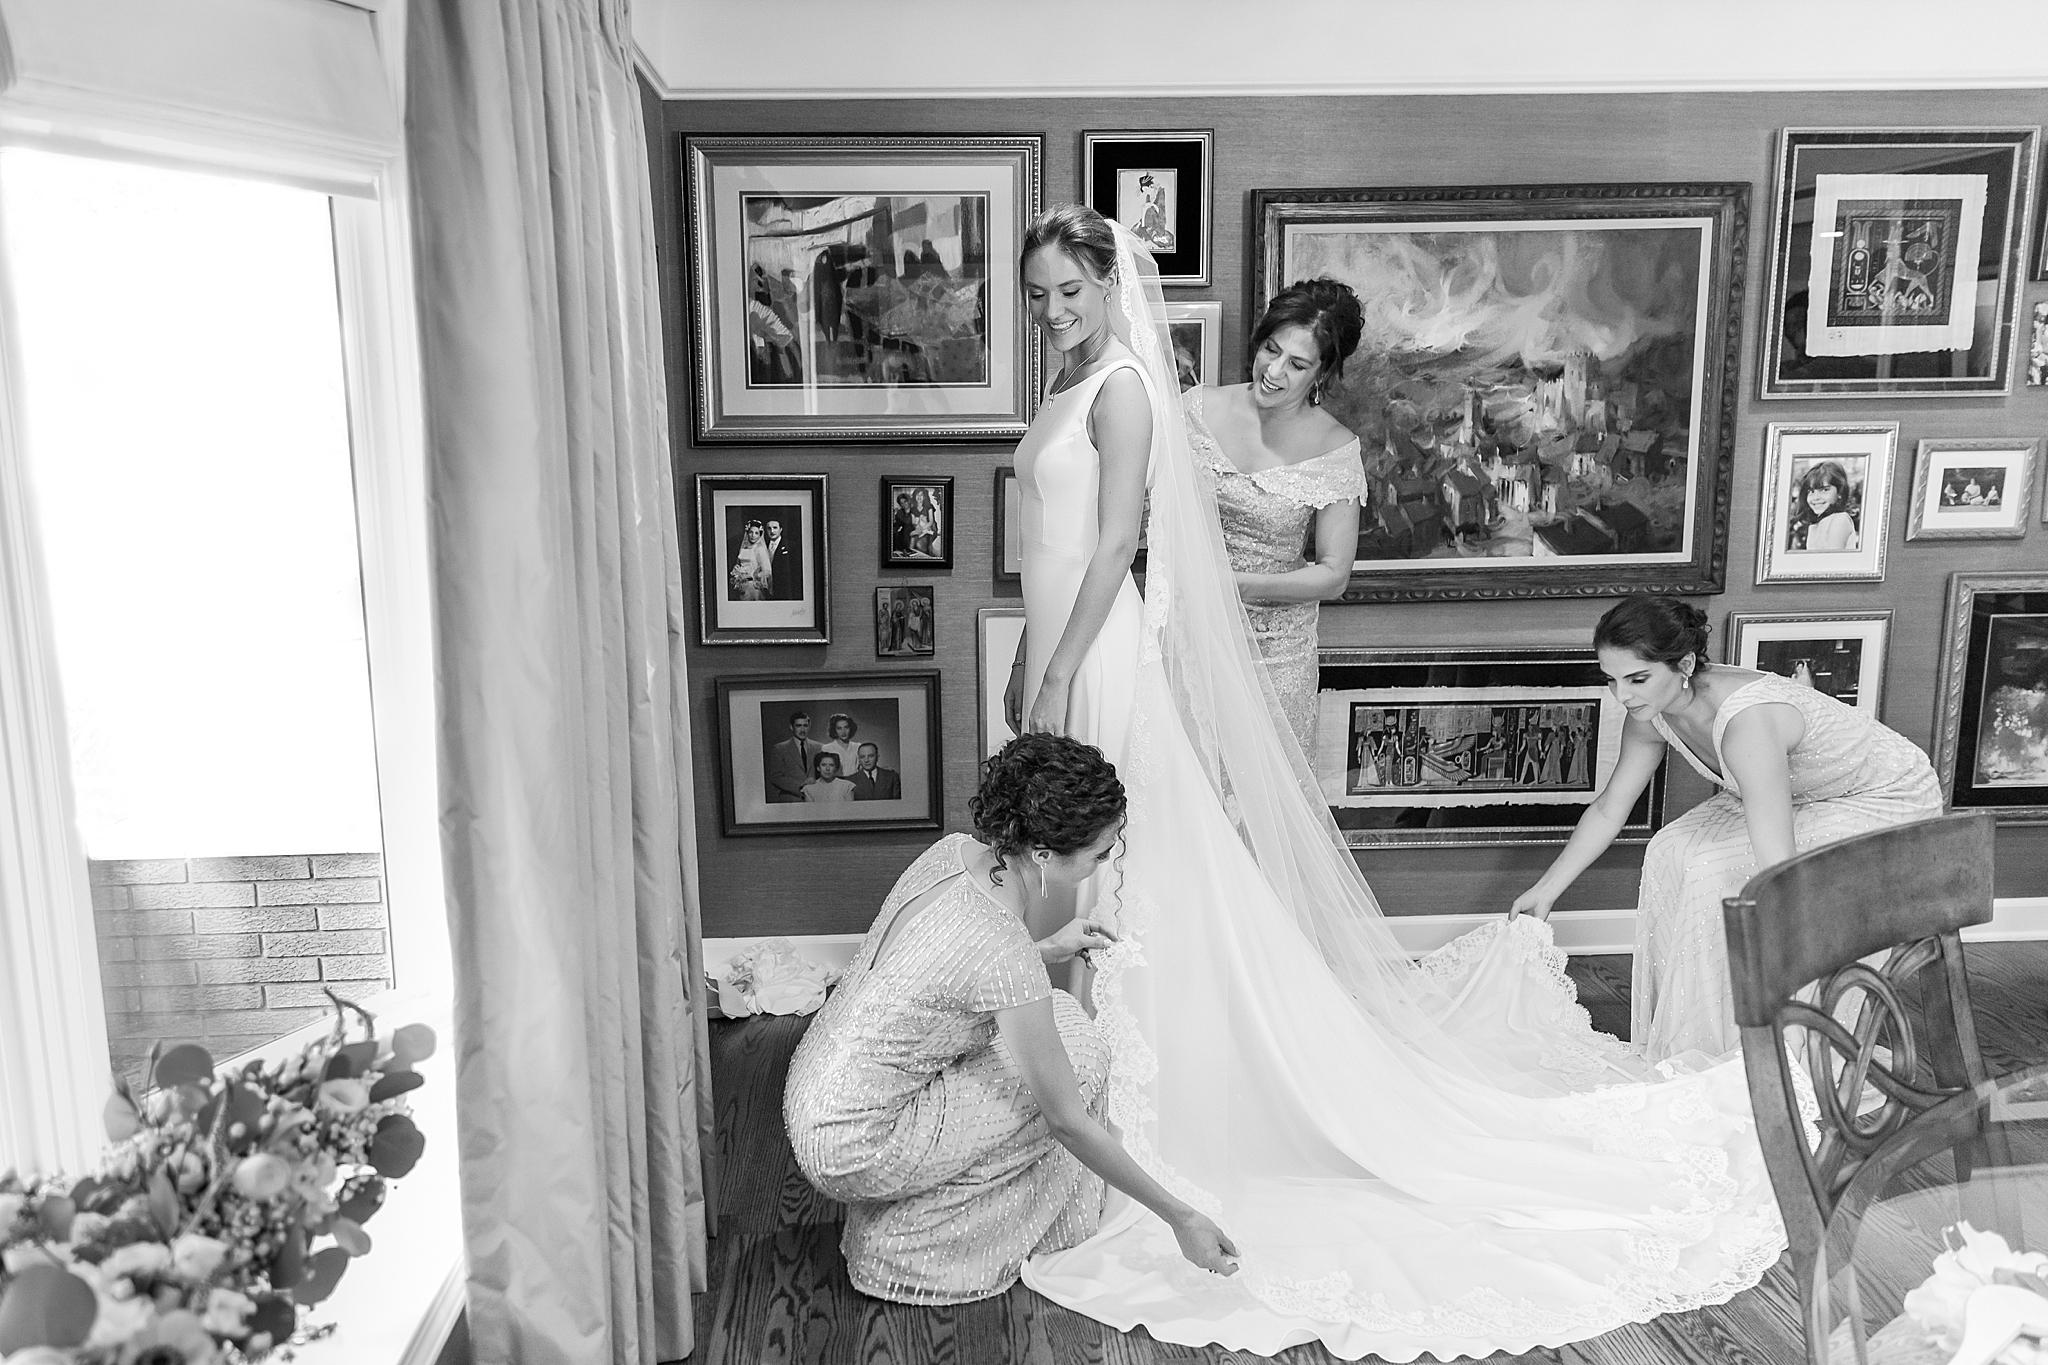 detroit-wedding-photographer-grosse-pointe-academy-chapel-detroit-golf-club-wedding-carly-matt-by-courtney-carolyn-photography_0010.jpg